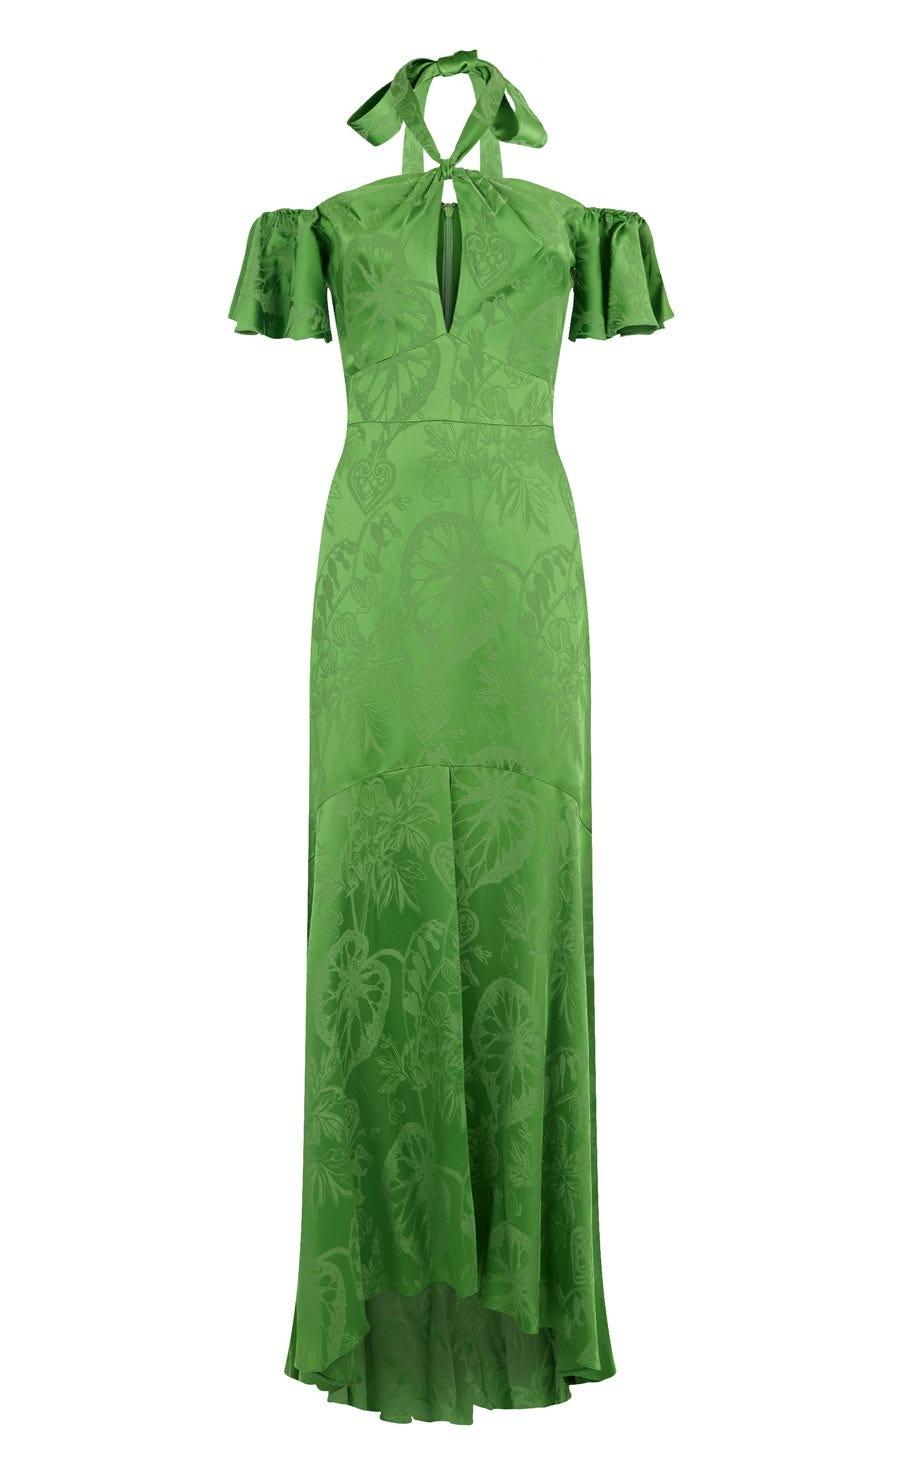 Orbit Dress, Absinthe